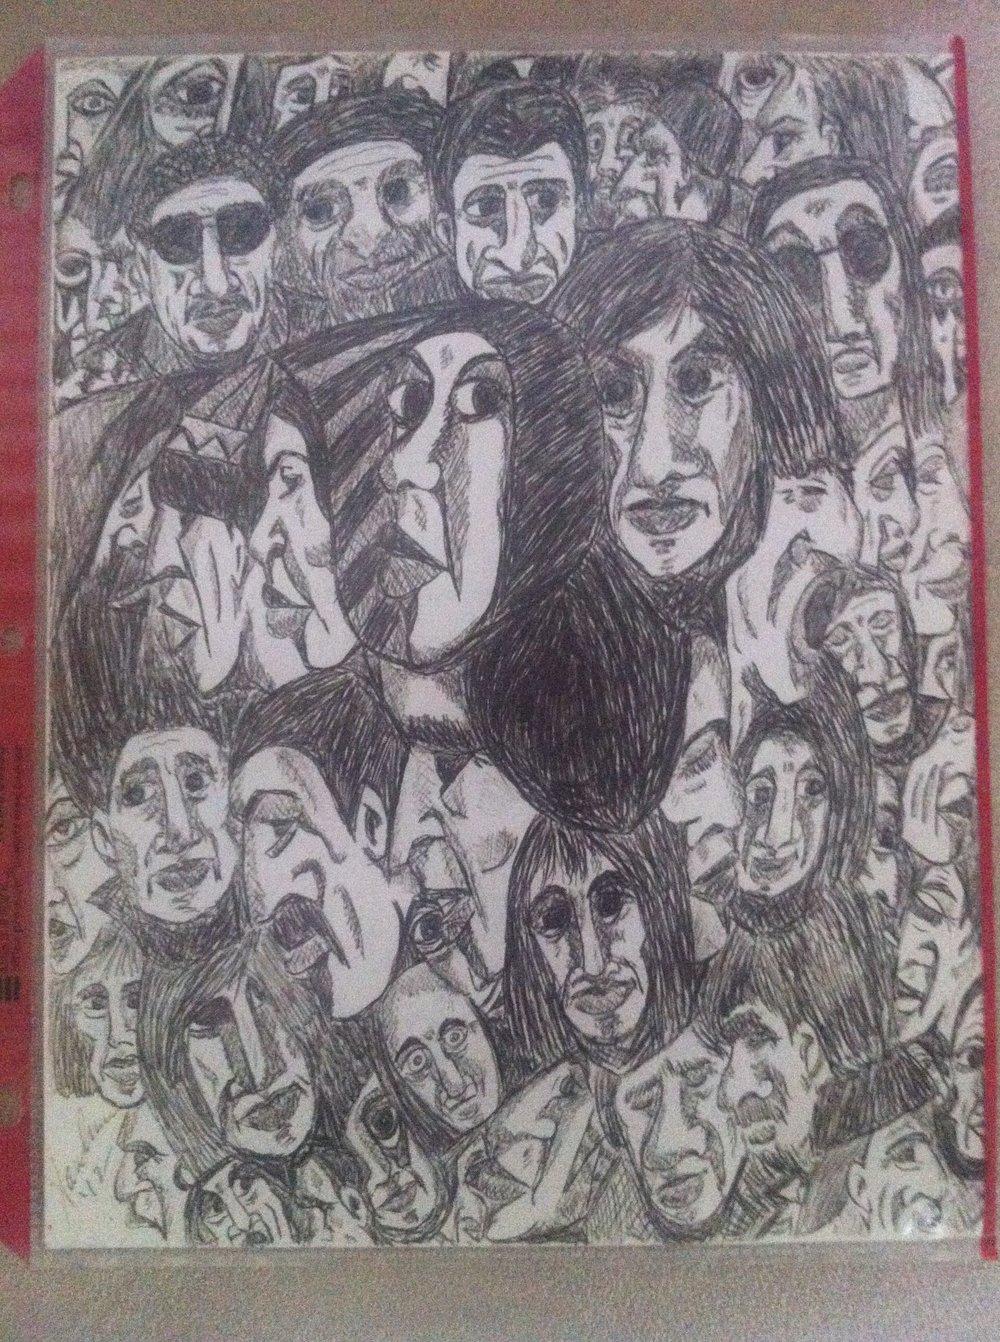 Mr. Sandman page #5.jpg